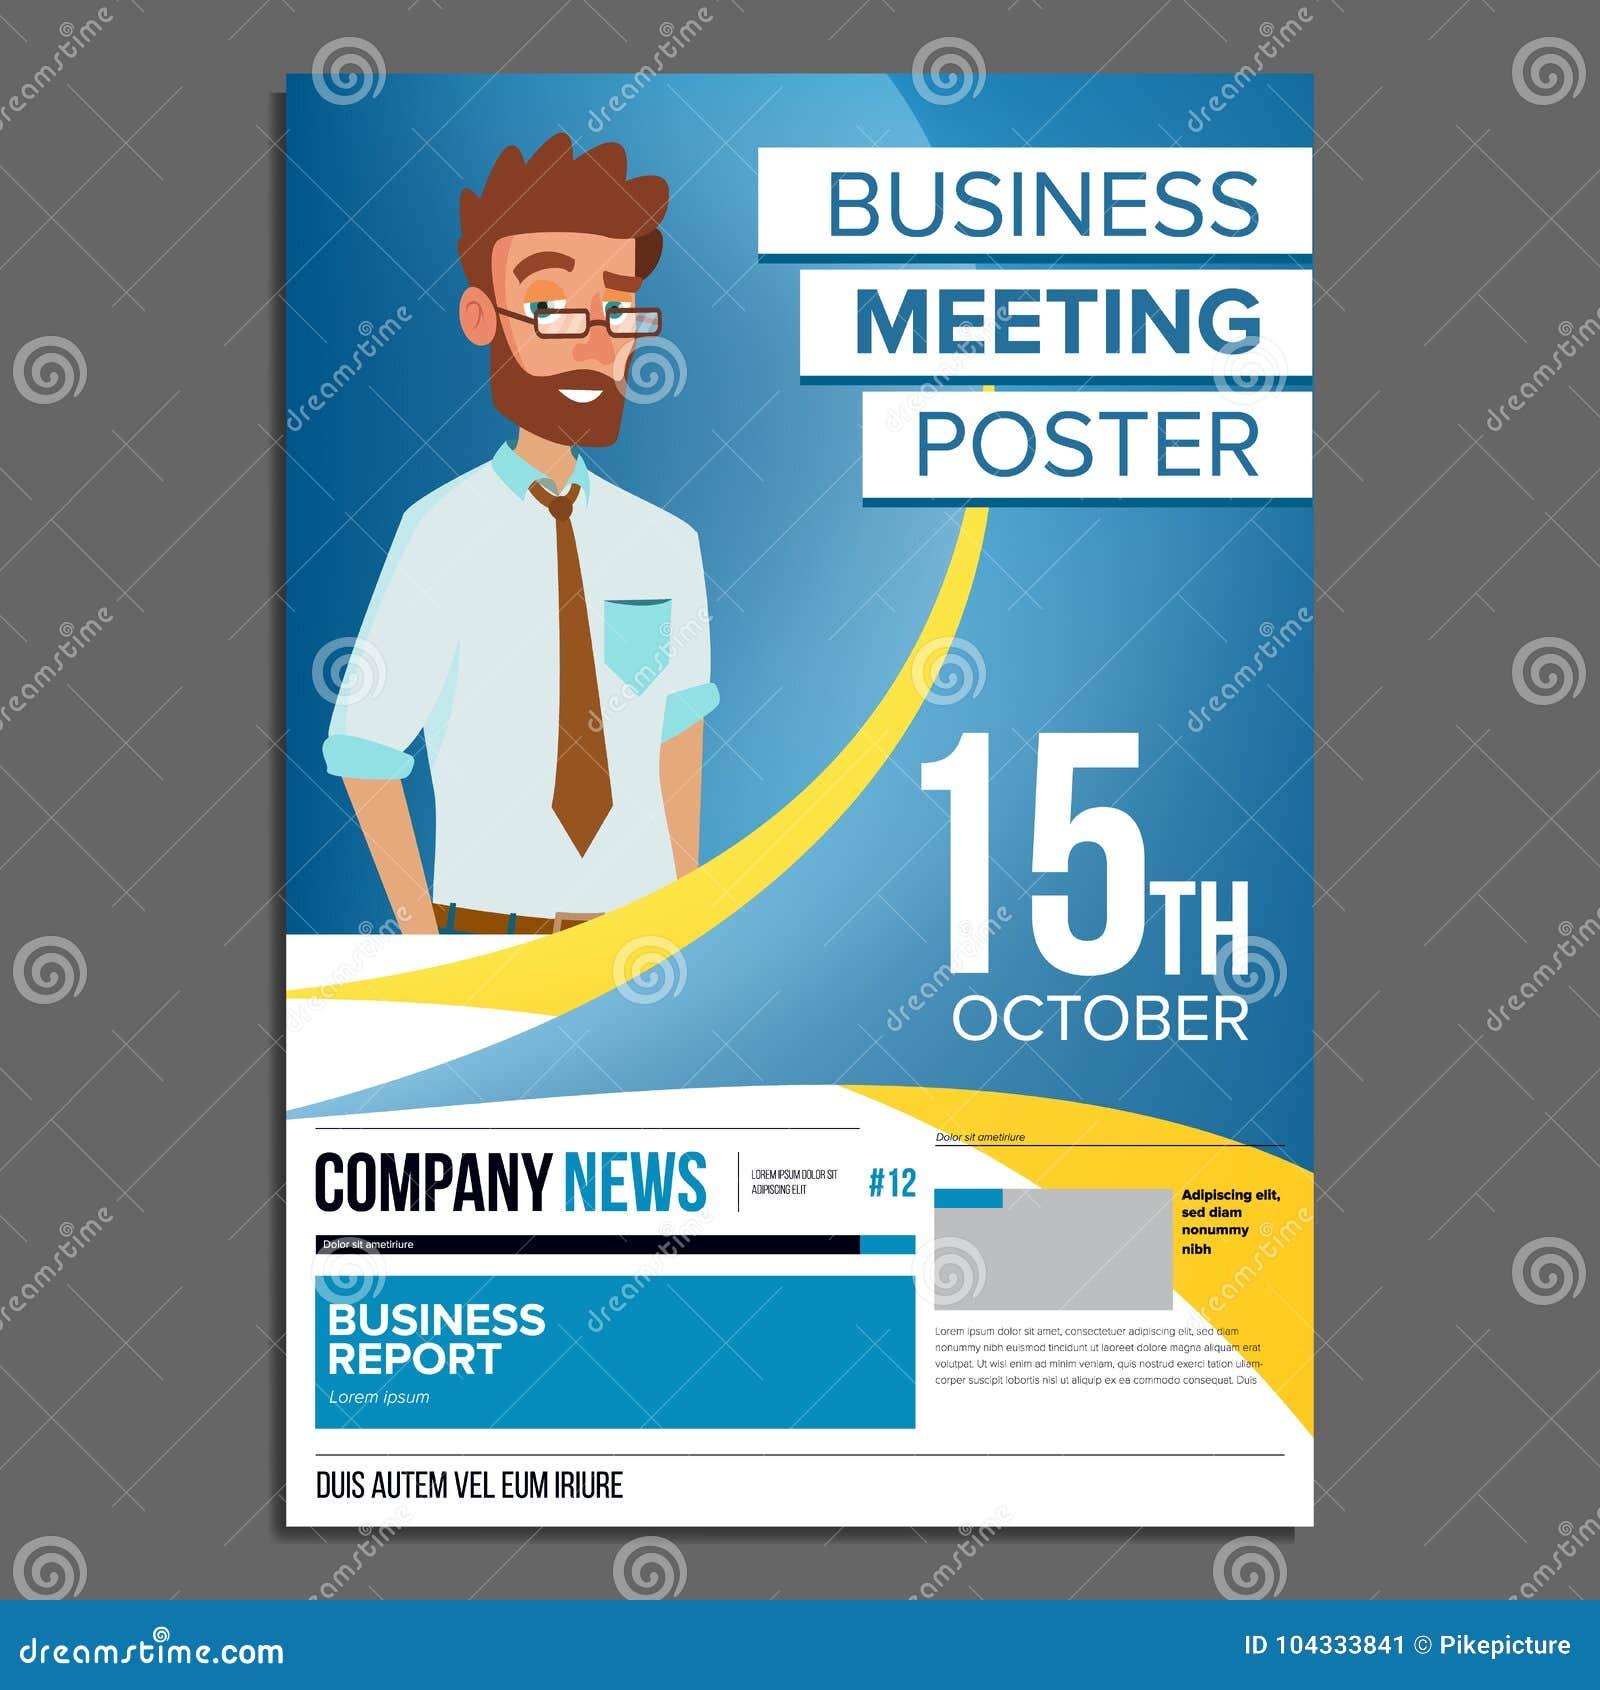 Business meeting poster vector businessman invitation for download business meeting poster vector businessman invitation for conference forum brainstorming stopboris Images